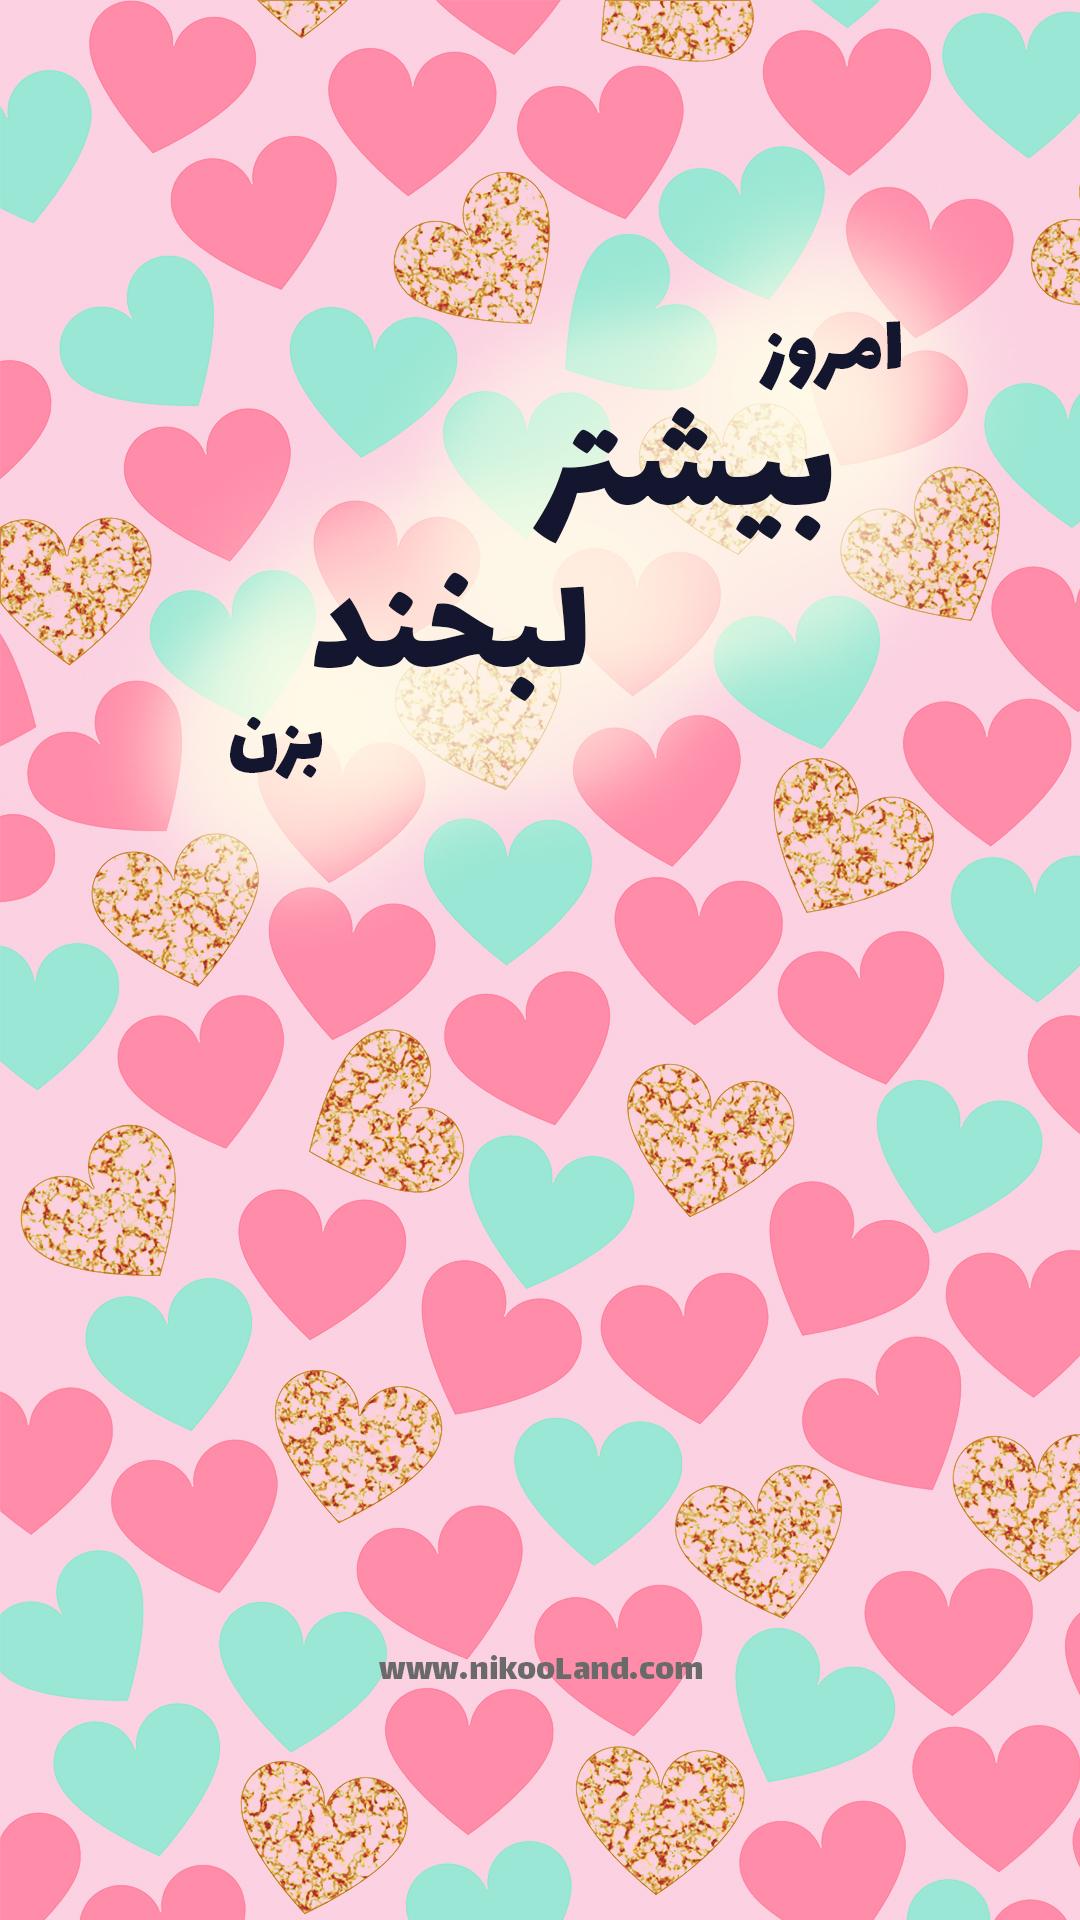 بک گراند قلب قلبی